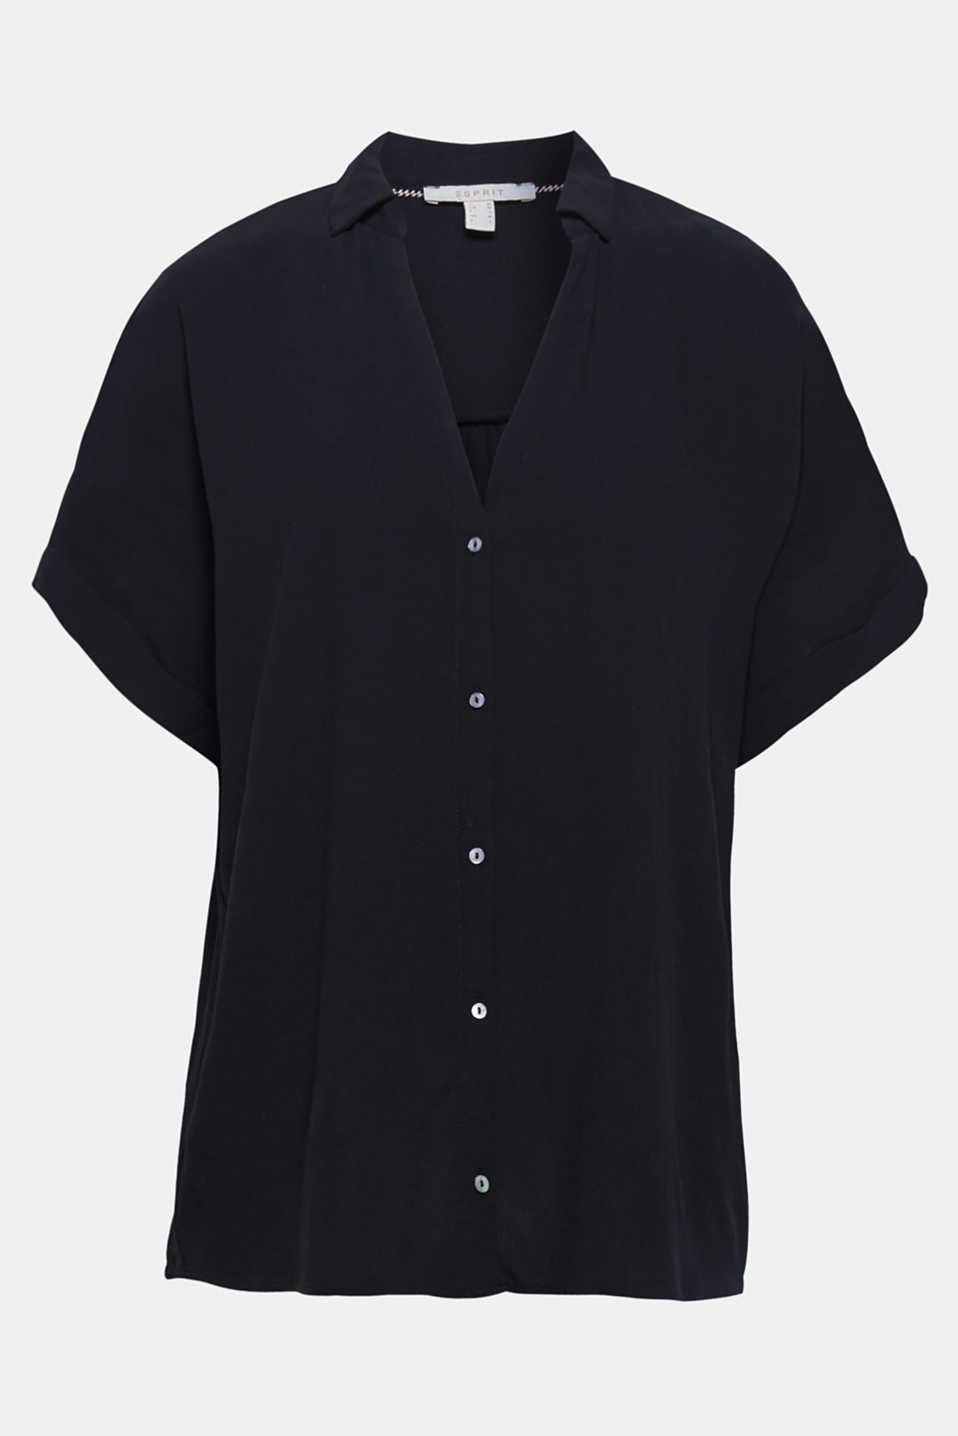 Hemdbluse schwarz